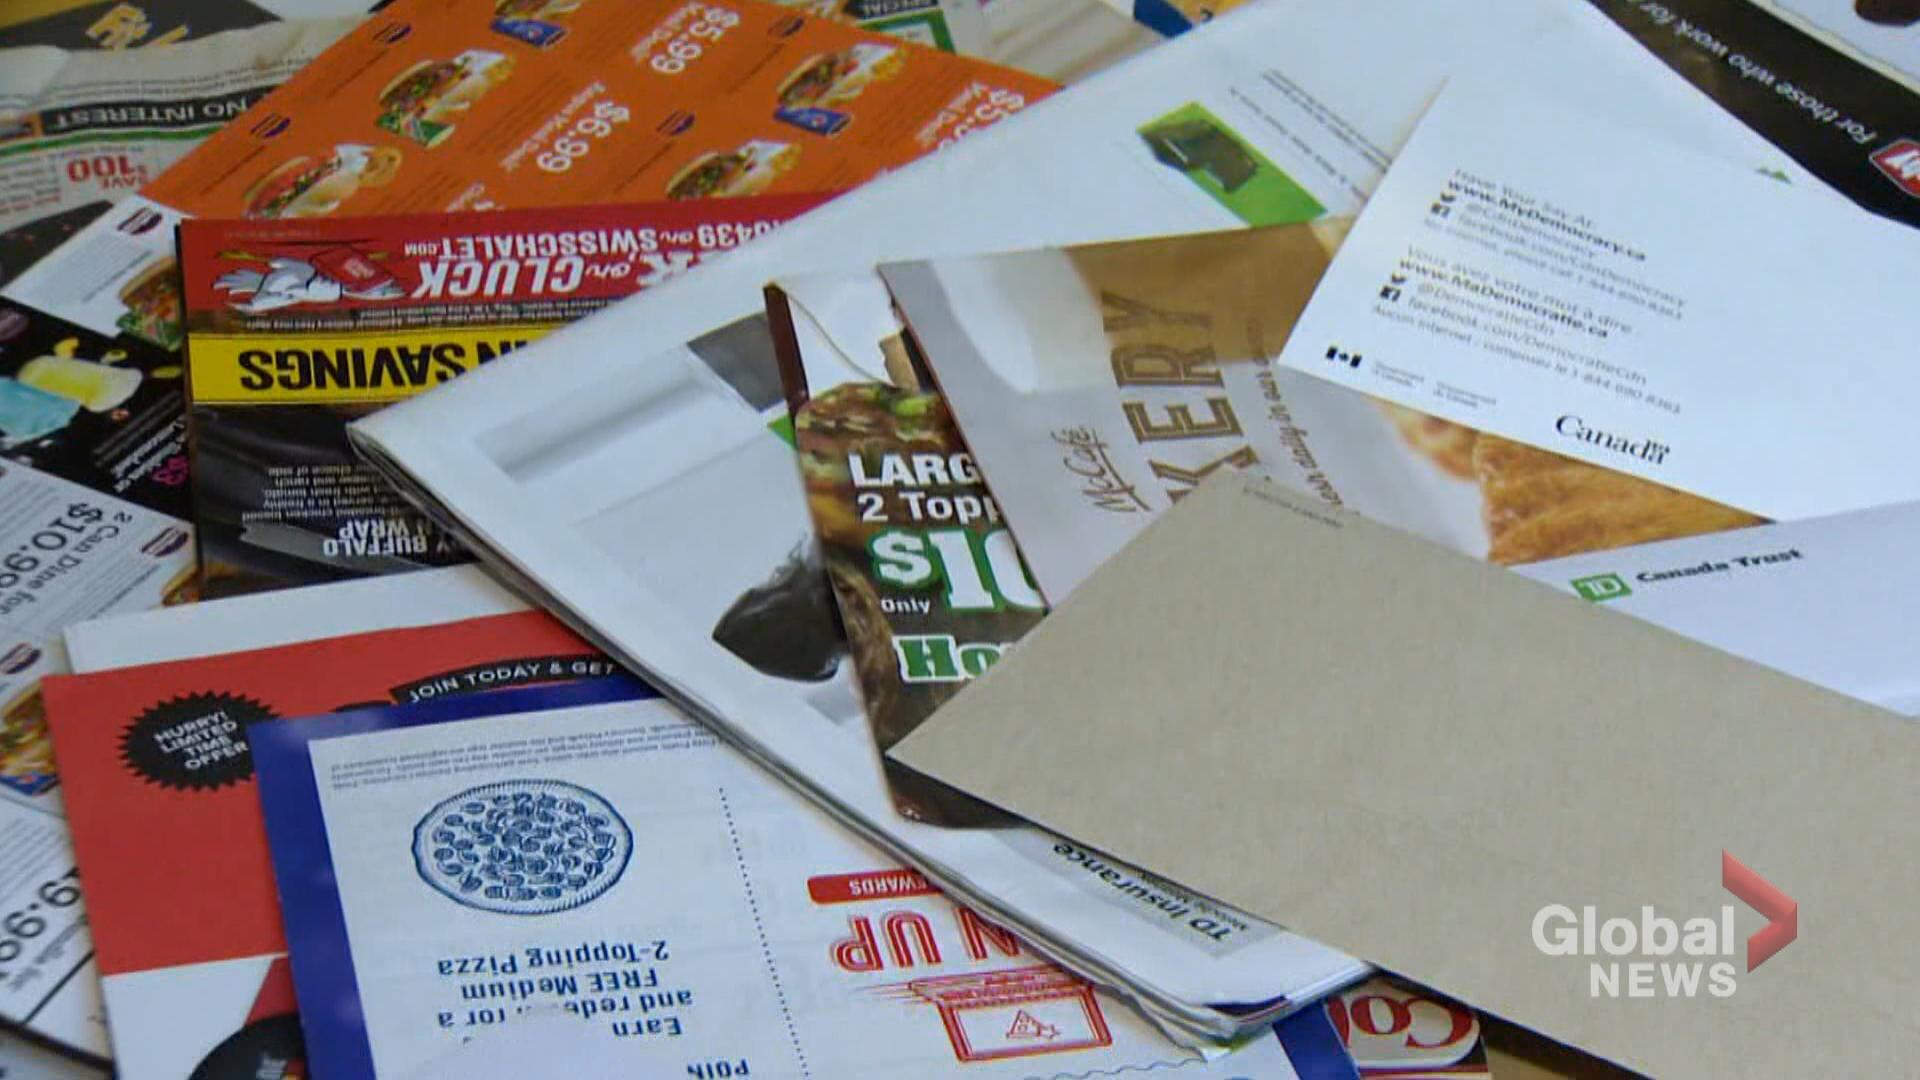 Saint John councilor proposes flyer bylaw